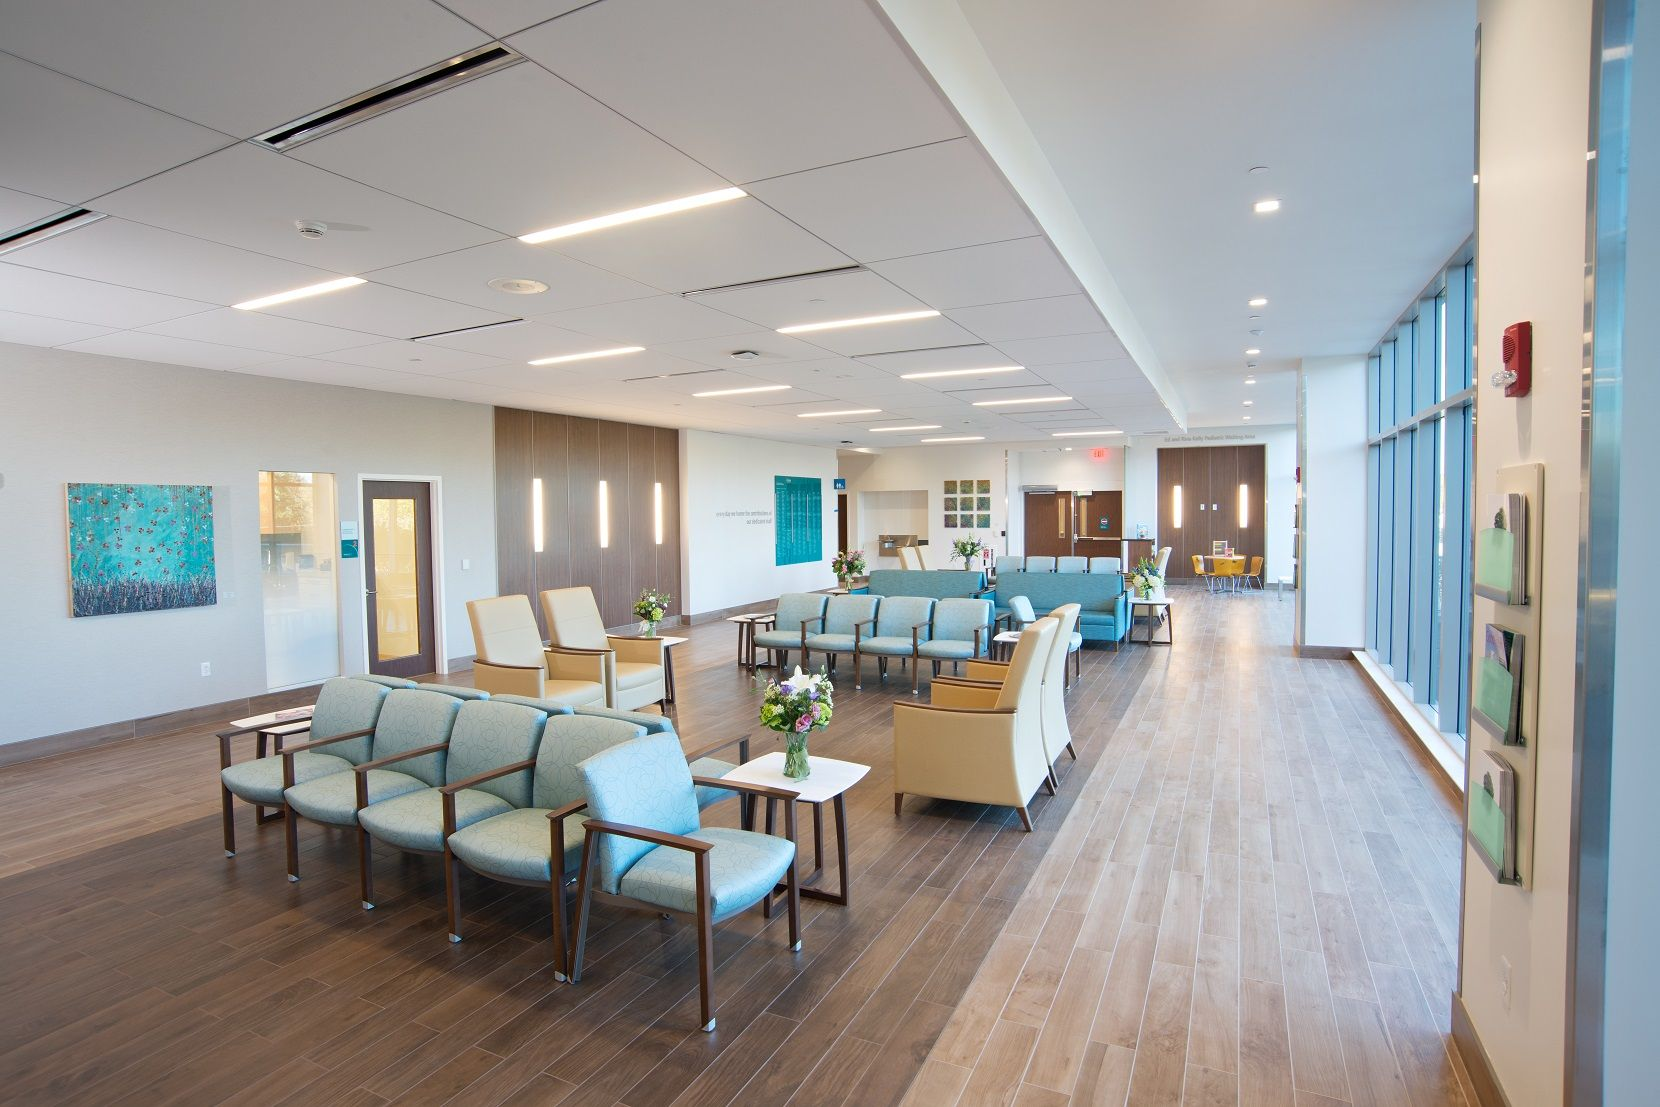 Emergency department milford regional medical center in milford ma interior design for Emergency room design floor plan